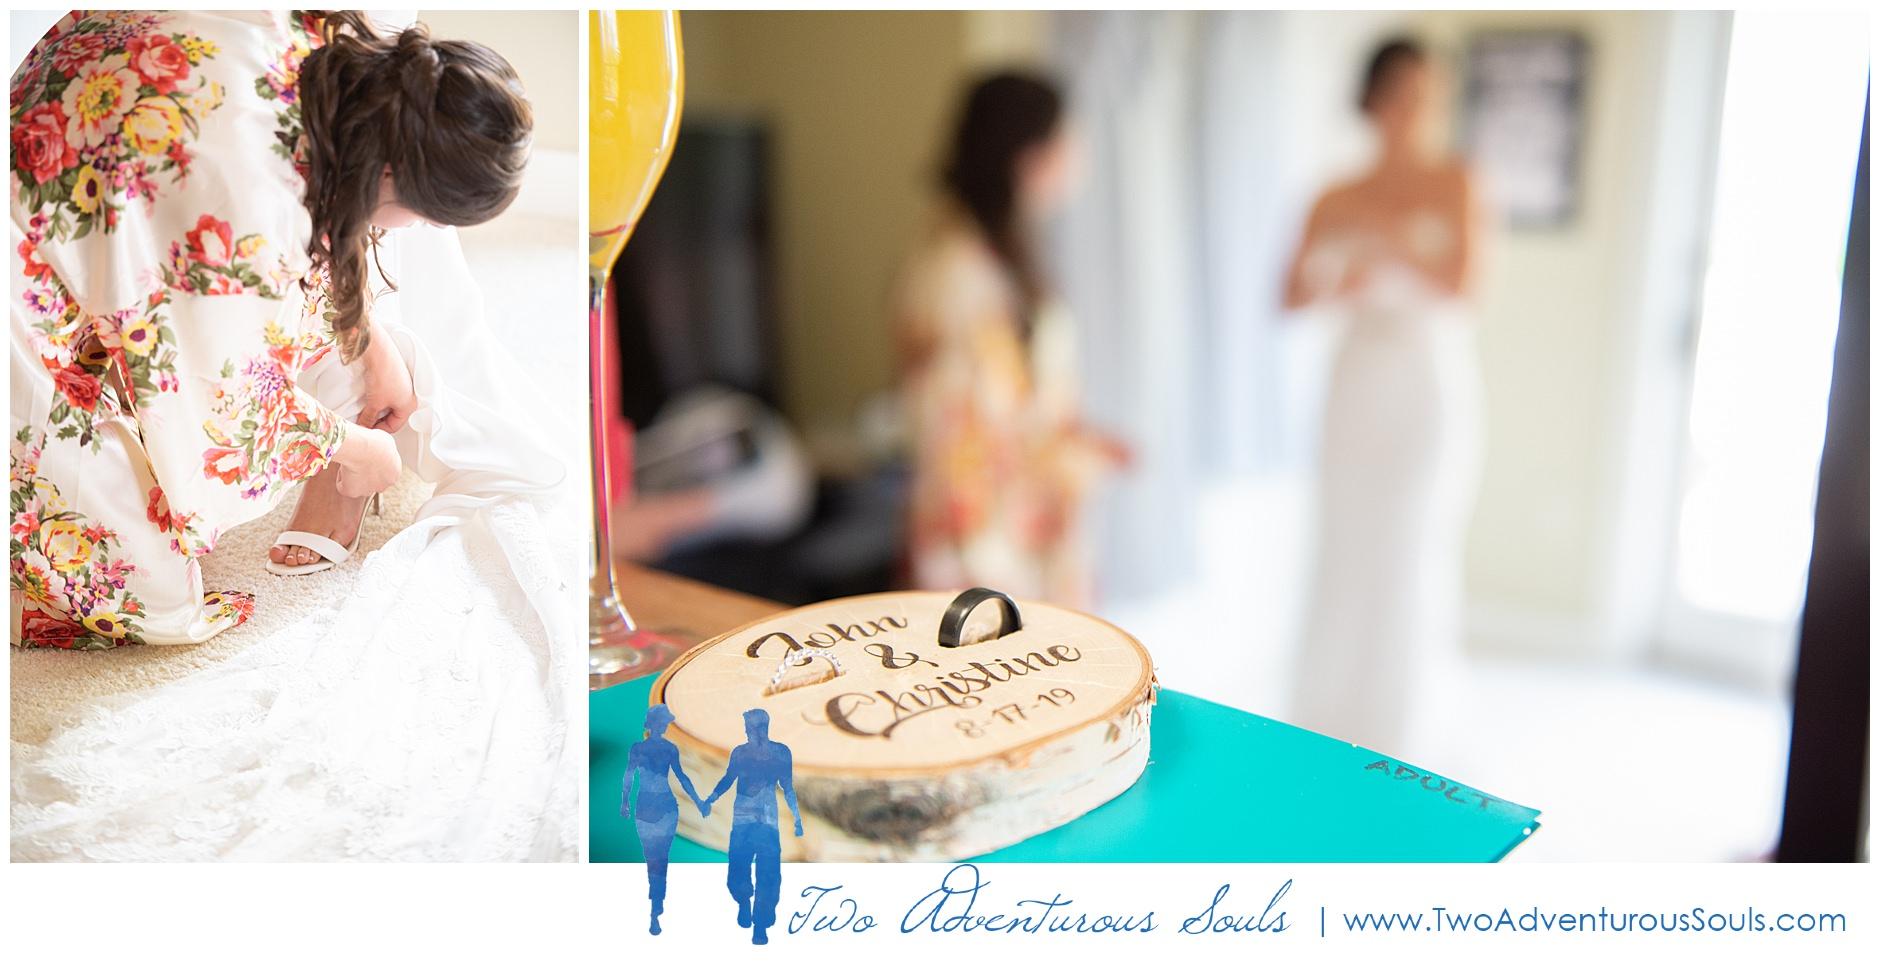 Sugarloaf Outdoor Center Wedding Photographers, Destination Wedding Photographers, Two Adventurous Souls-081719_0013.jpg